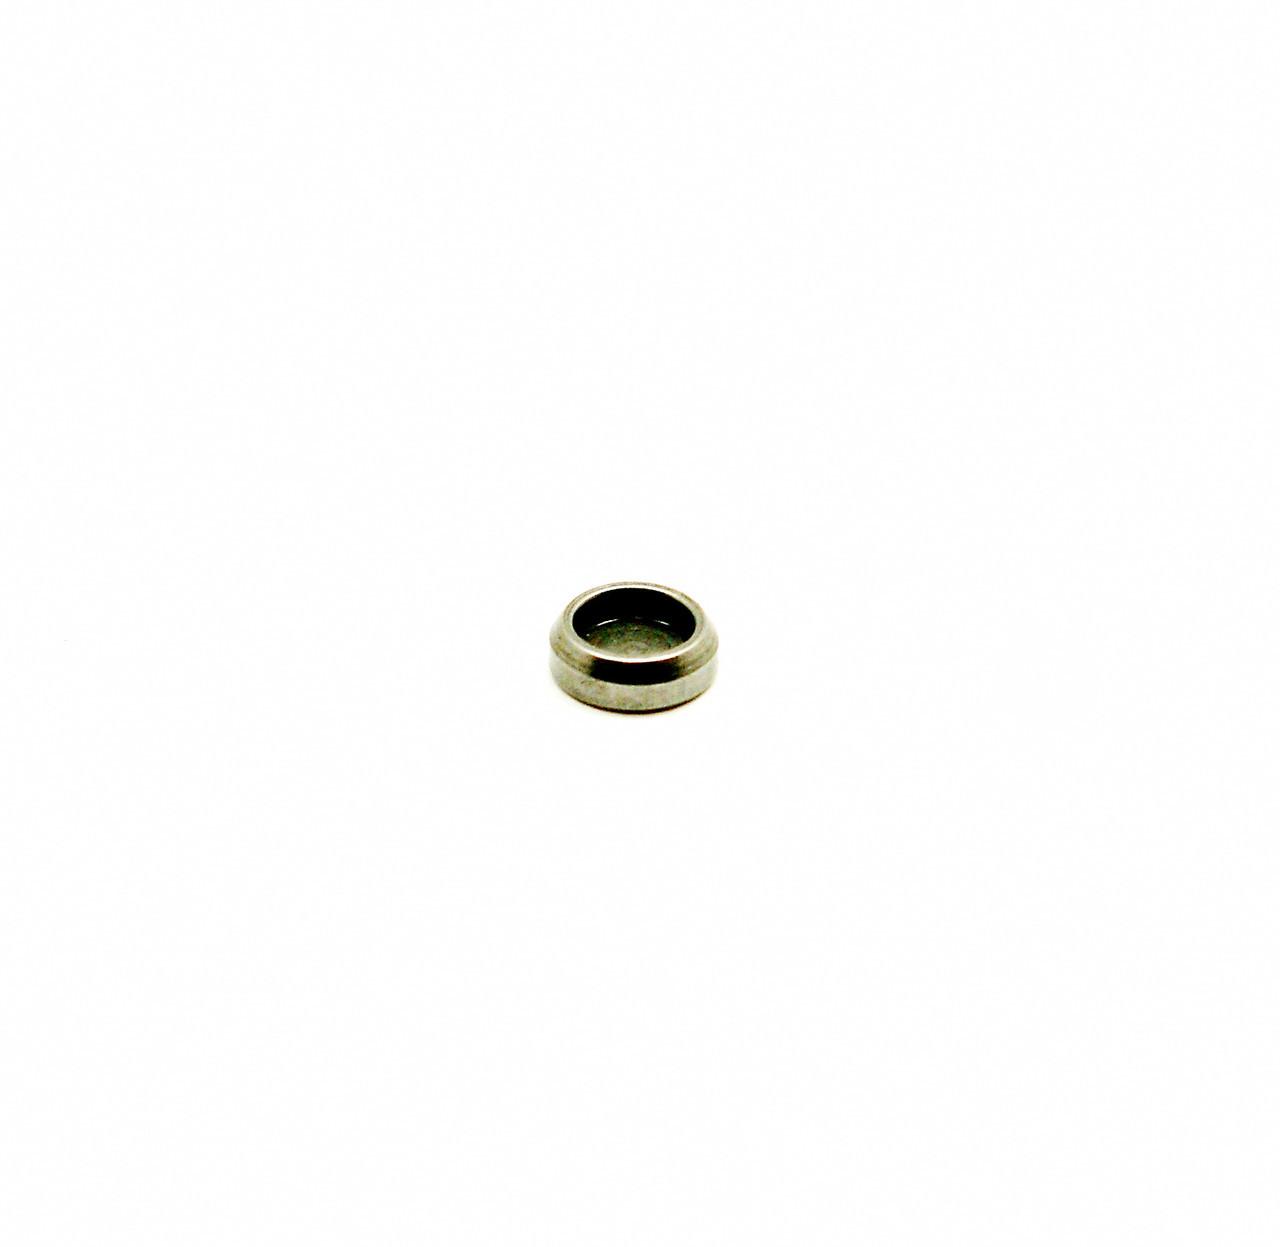 Колпачок клапана Cummins B3.3 4982900 C6204414550